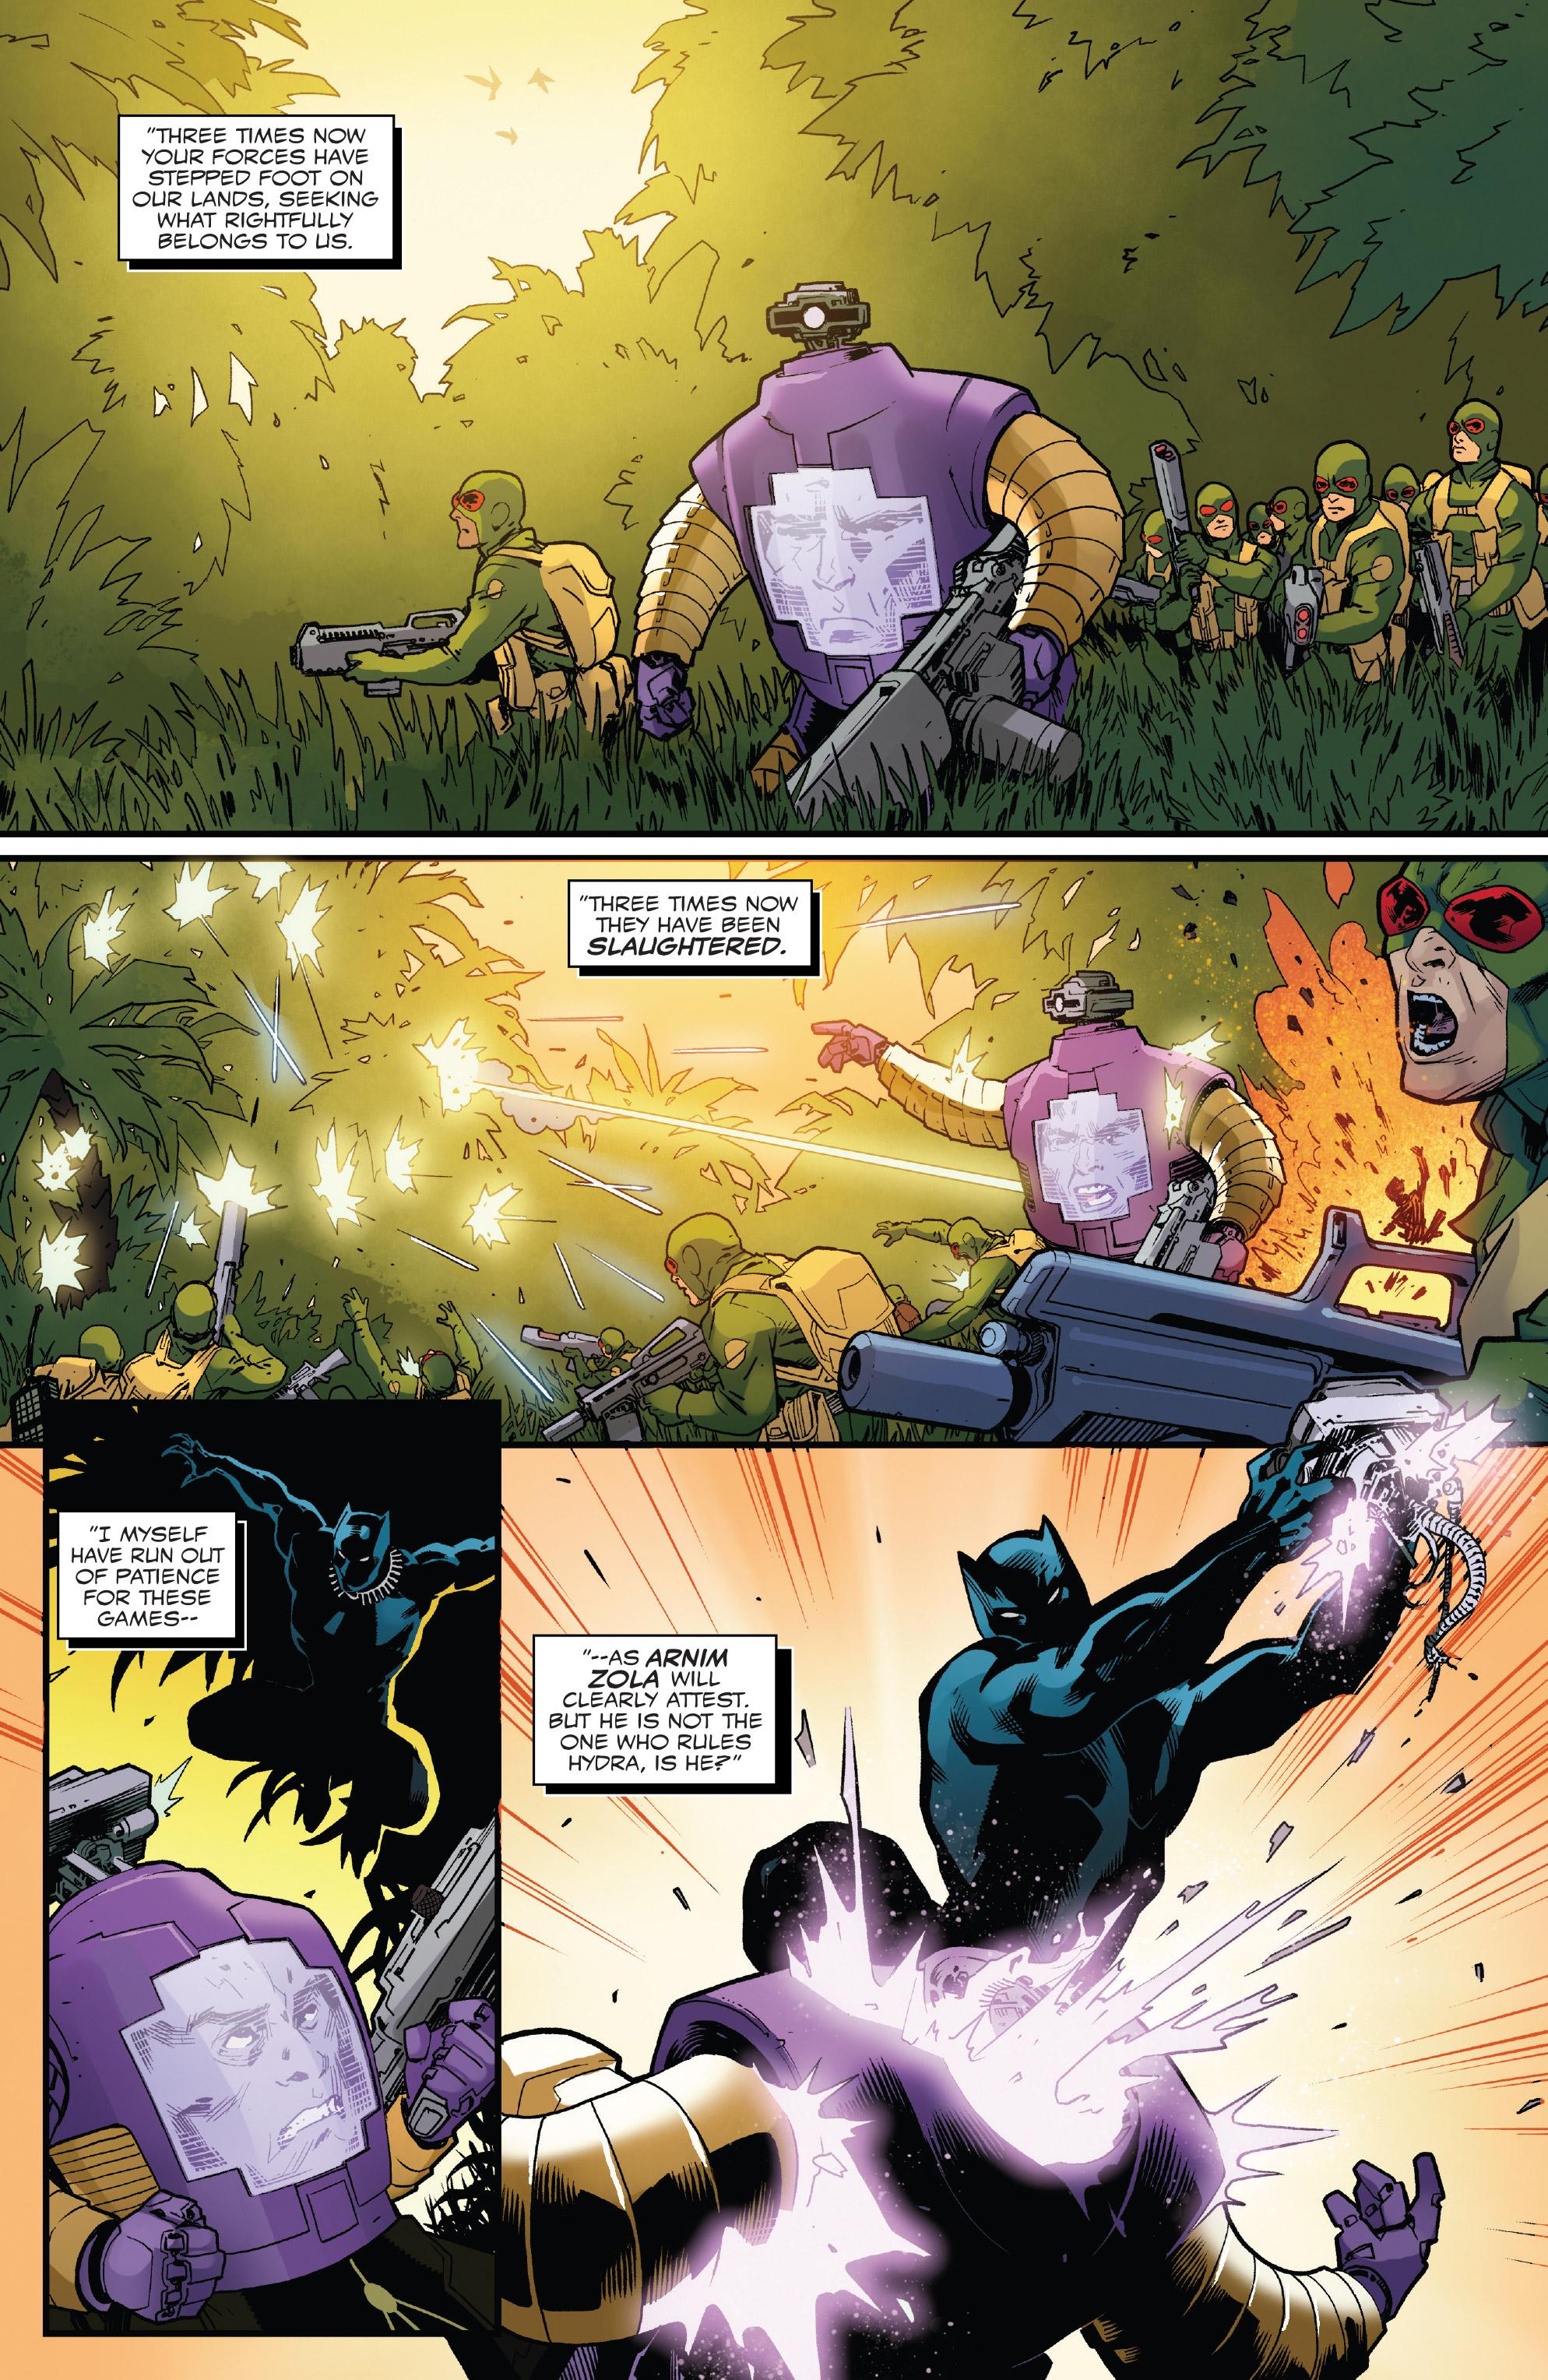 Read online Captain America: Steve Rogers comic -  Issue #18 - 18